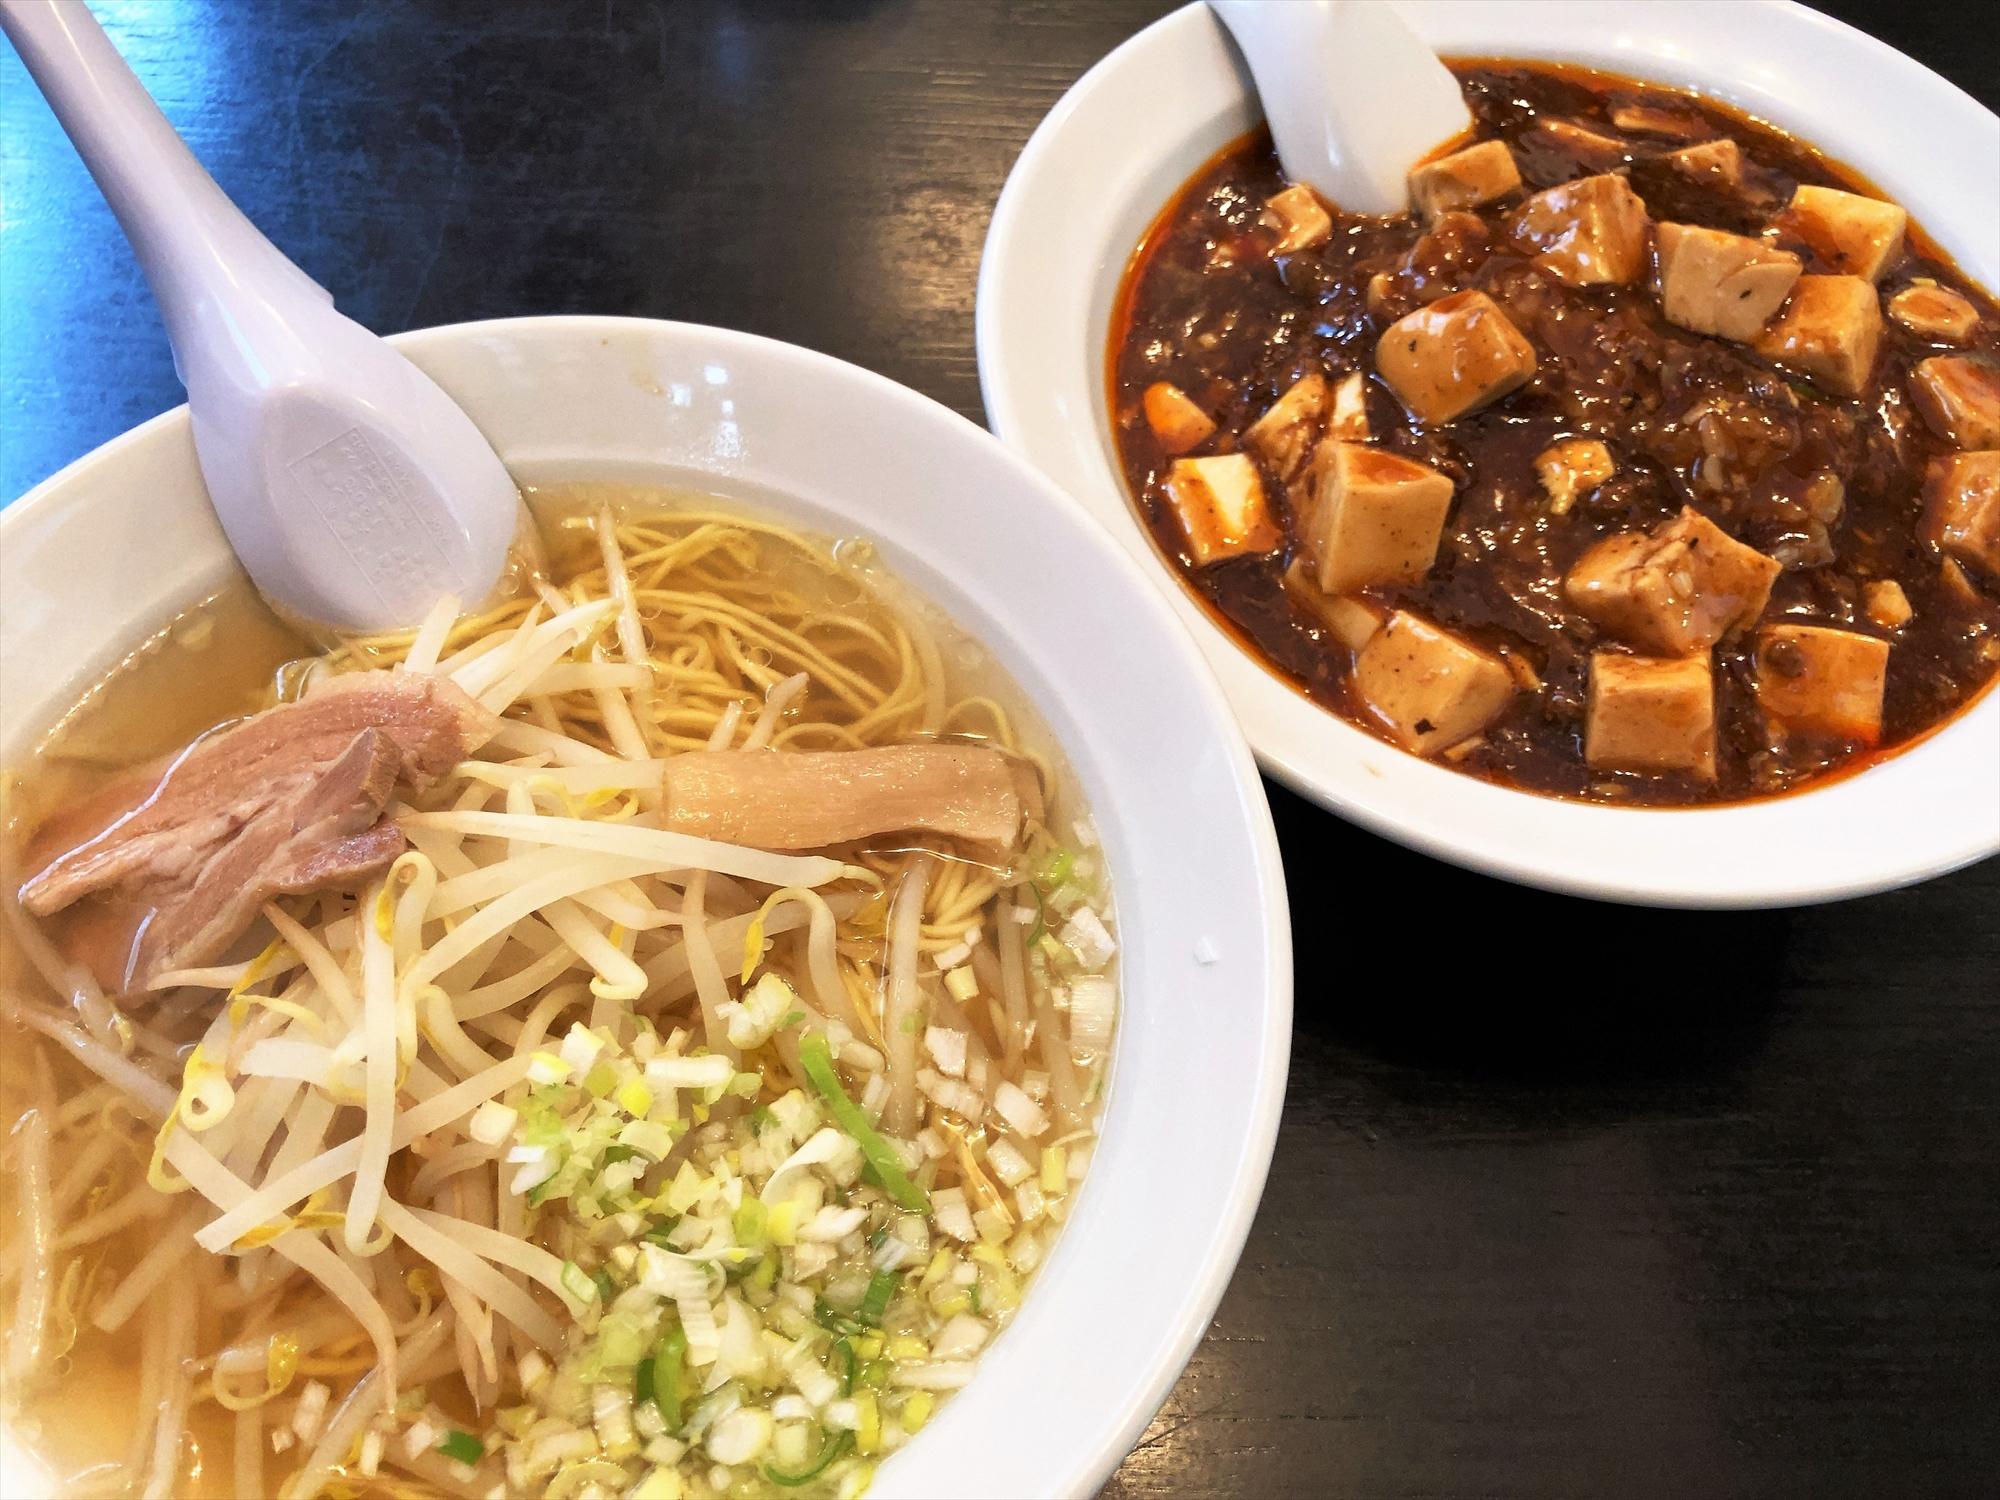 本場中国料理999小籠包「昼丼セット」